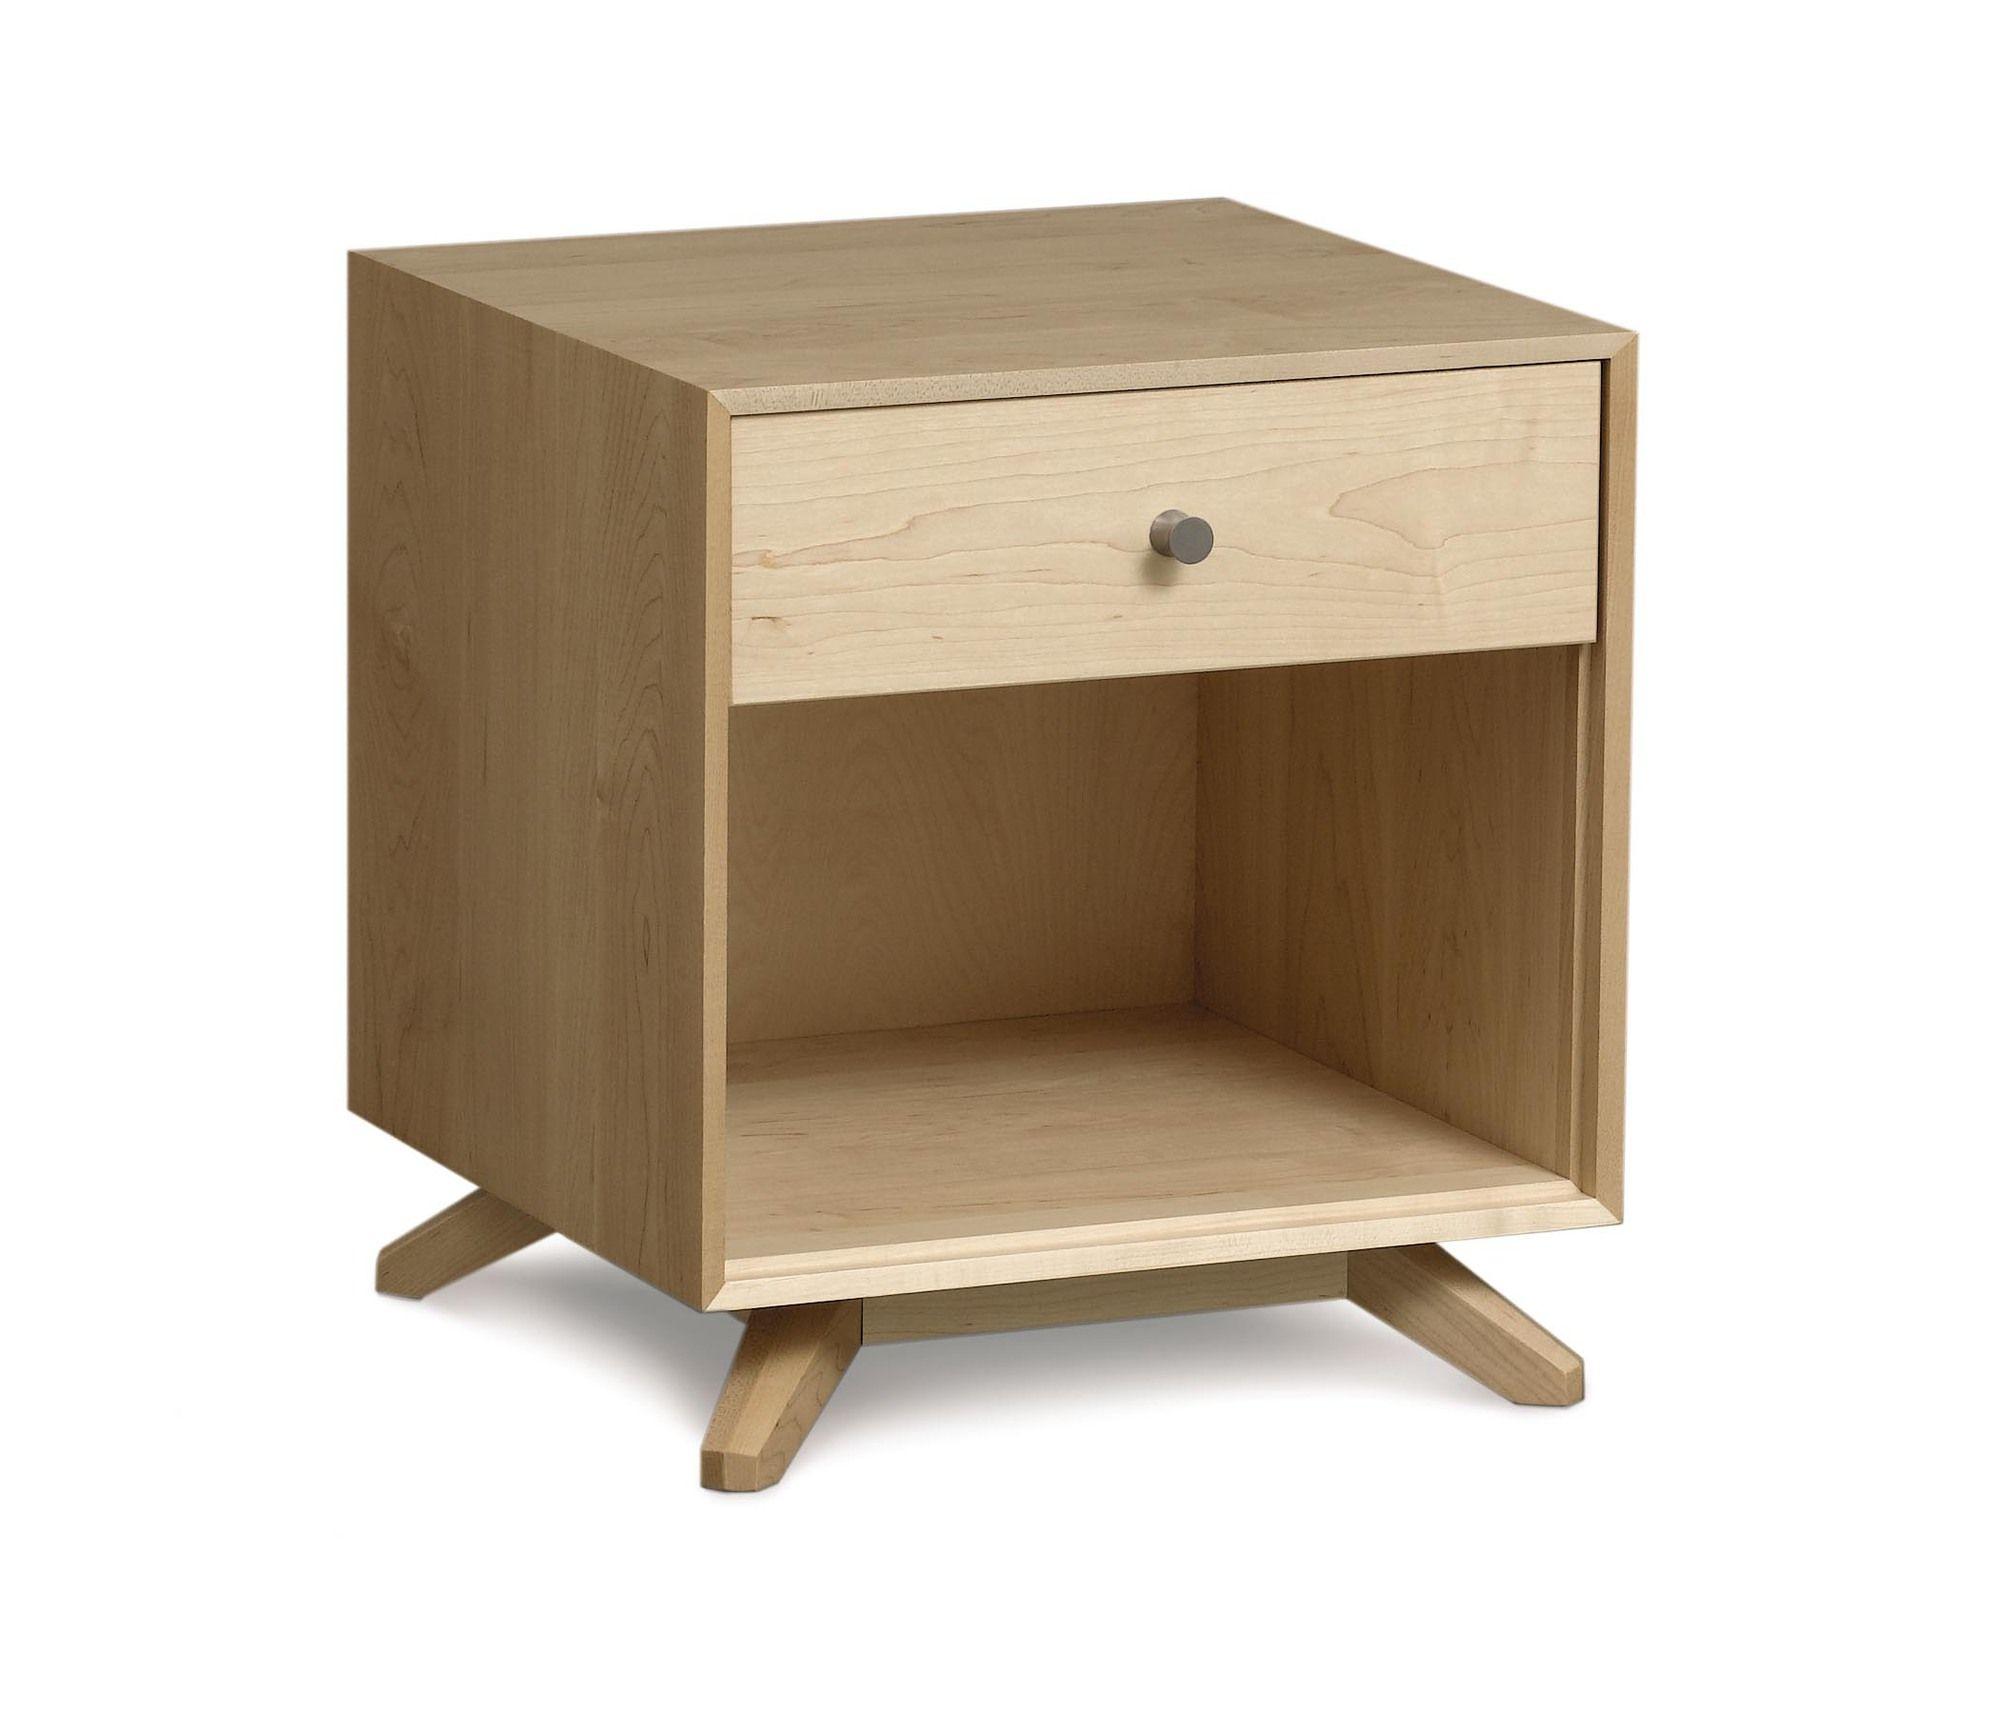 Copeland Furniture Astrid Nightstand Furniture, Copeland